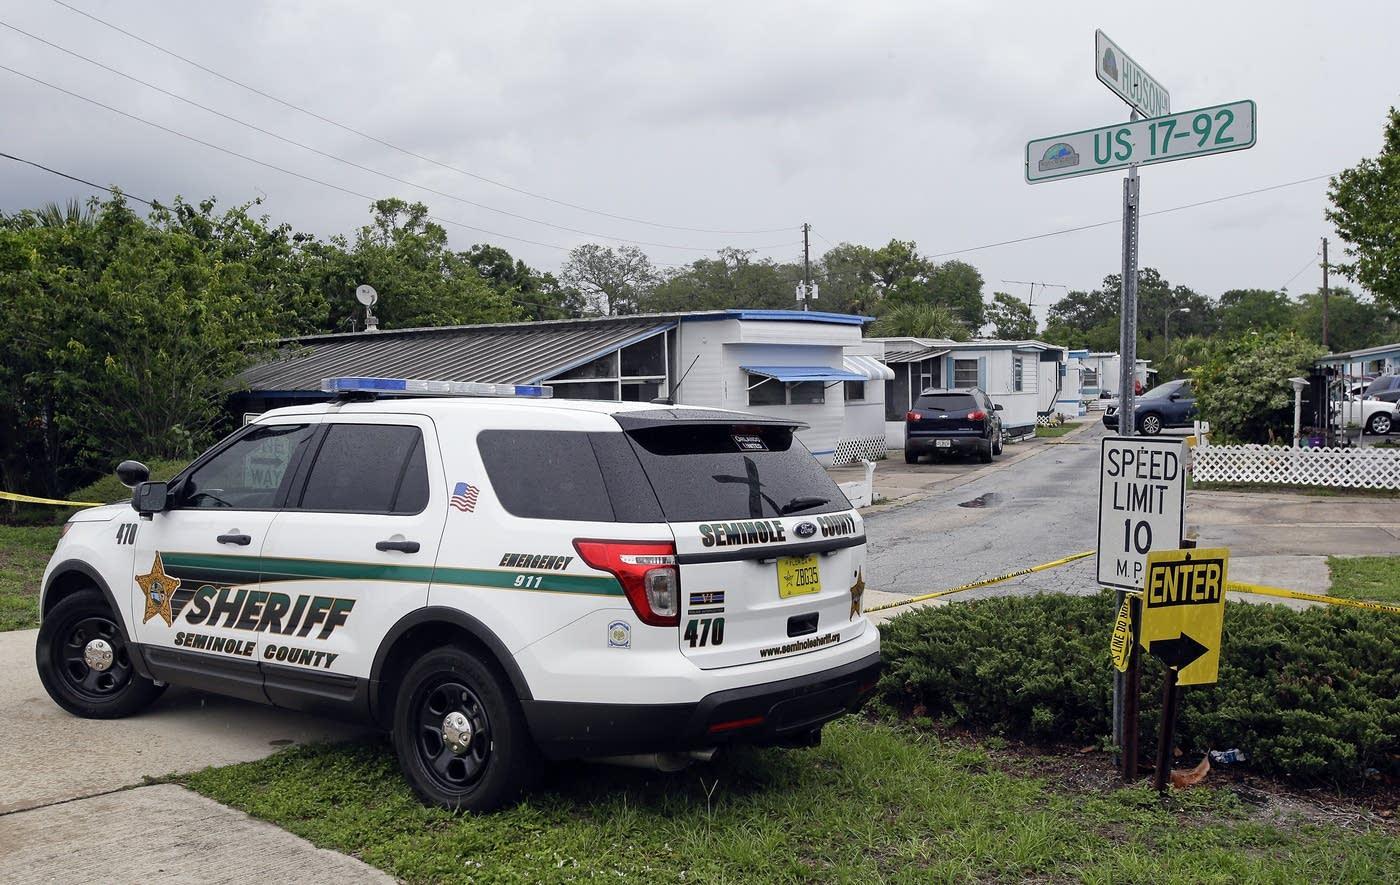 Seminole county arrest photos Current Tattoo Trends involving lettering, custom fonts